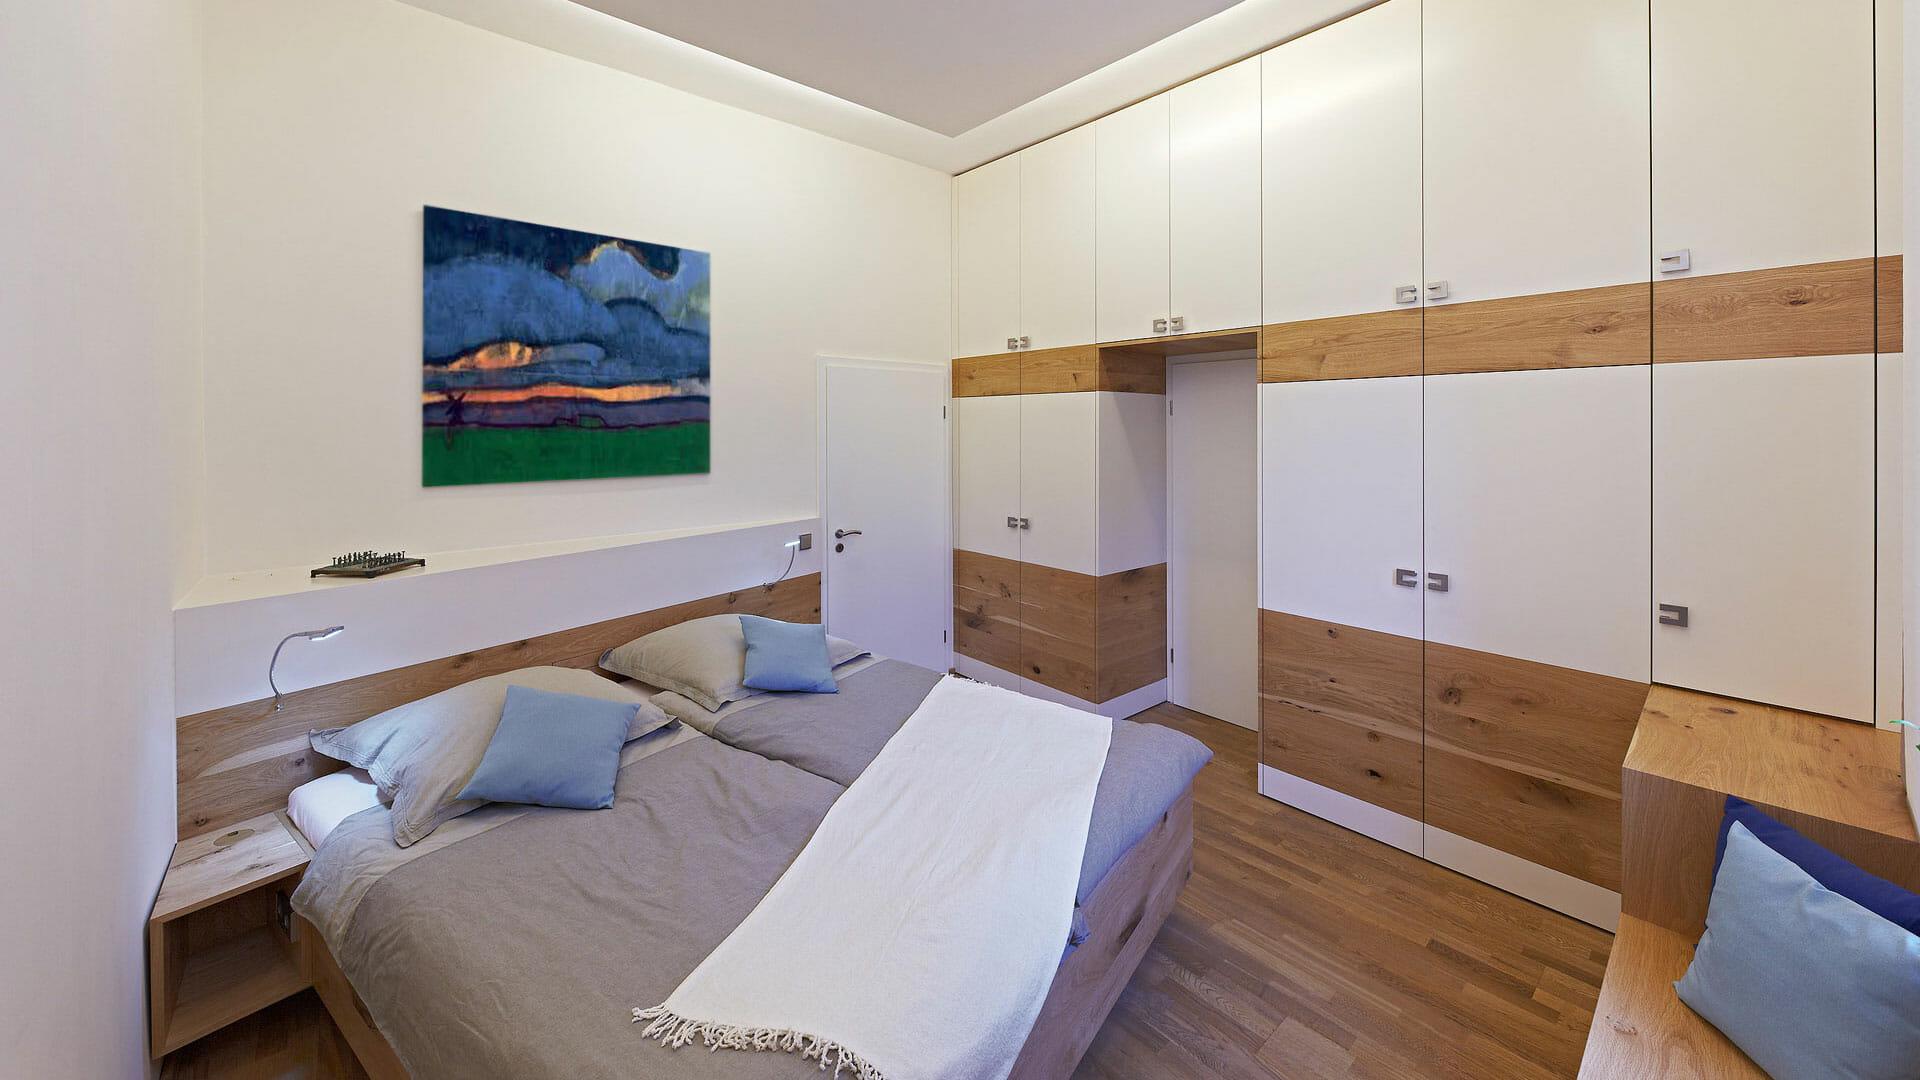 Modernes massivholz schlafzimmer diemeistertischler - Schlafzimmer massivholz modern ...